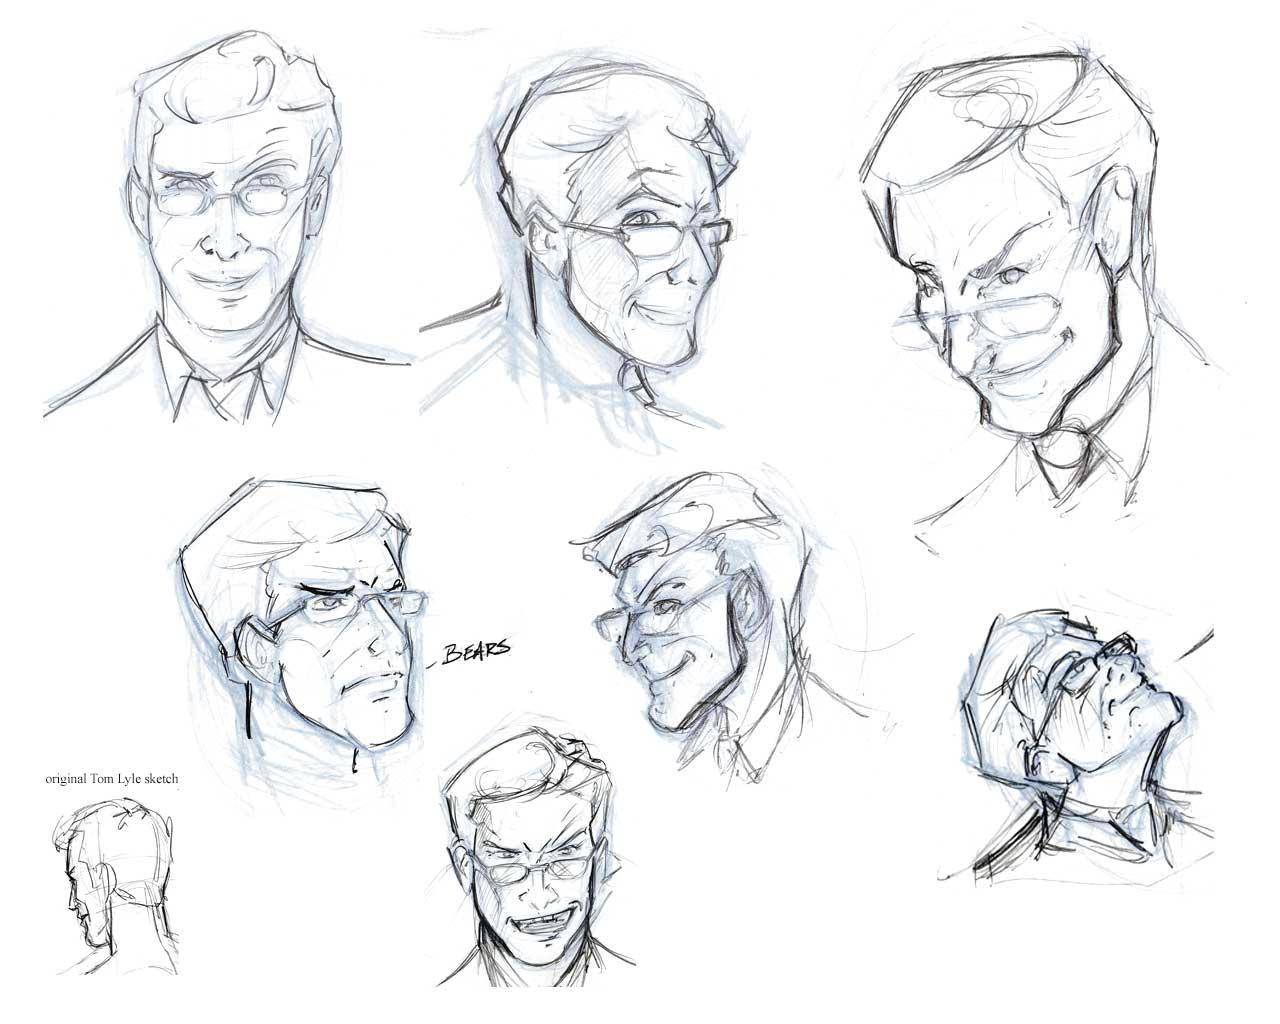 Stephen Colbert sketchness by artobot